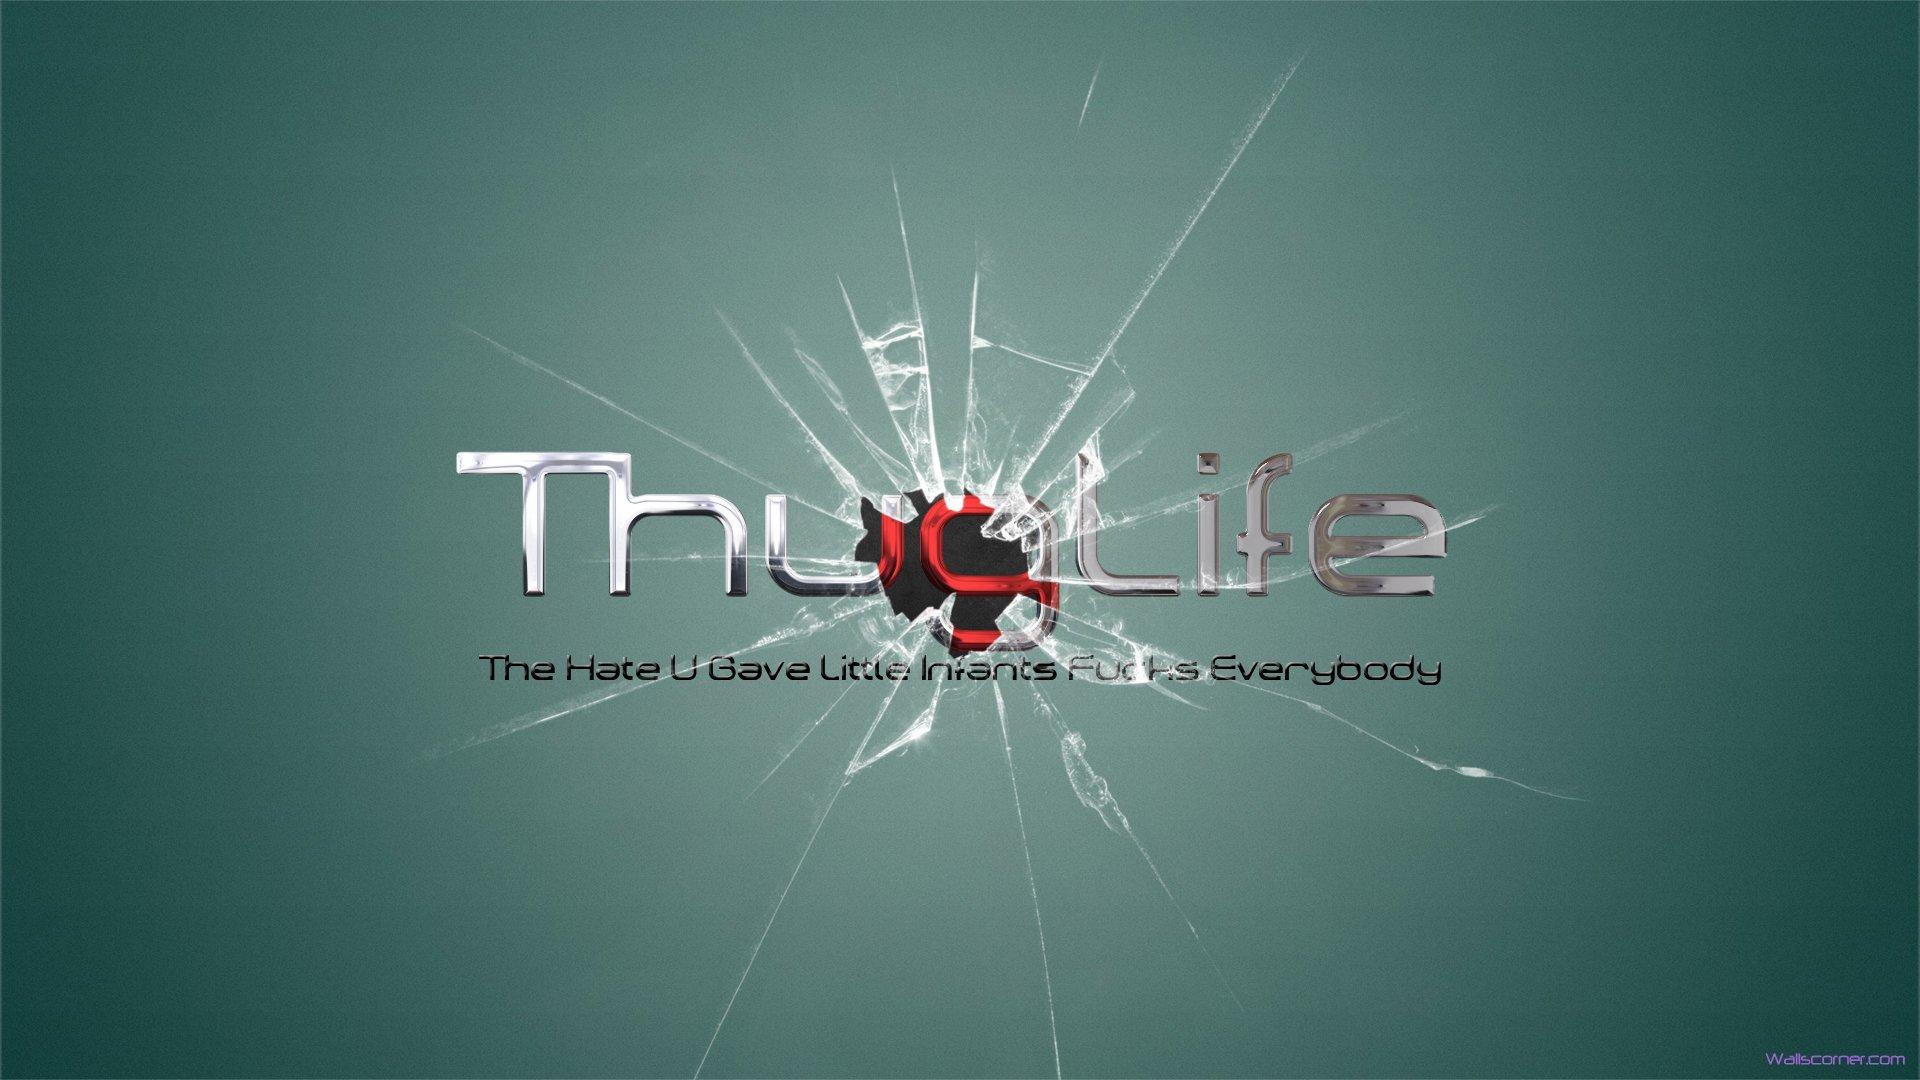 resolutions of thug life beauty thug life hd wallpaper wallpaper hd 1920x1080